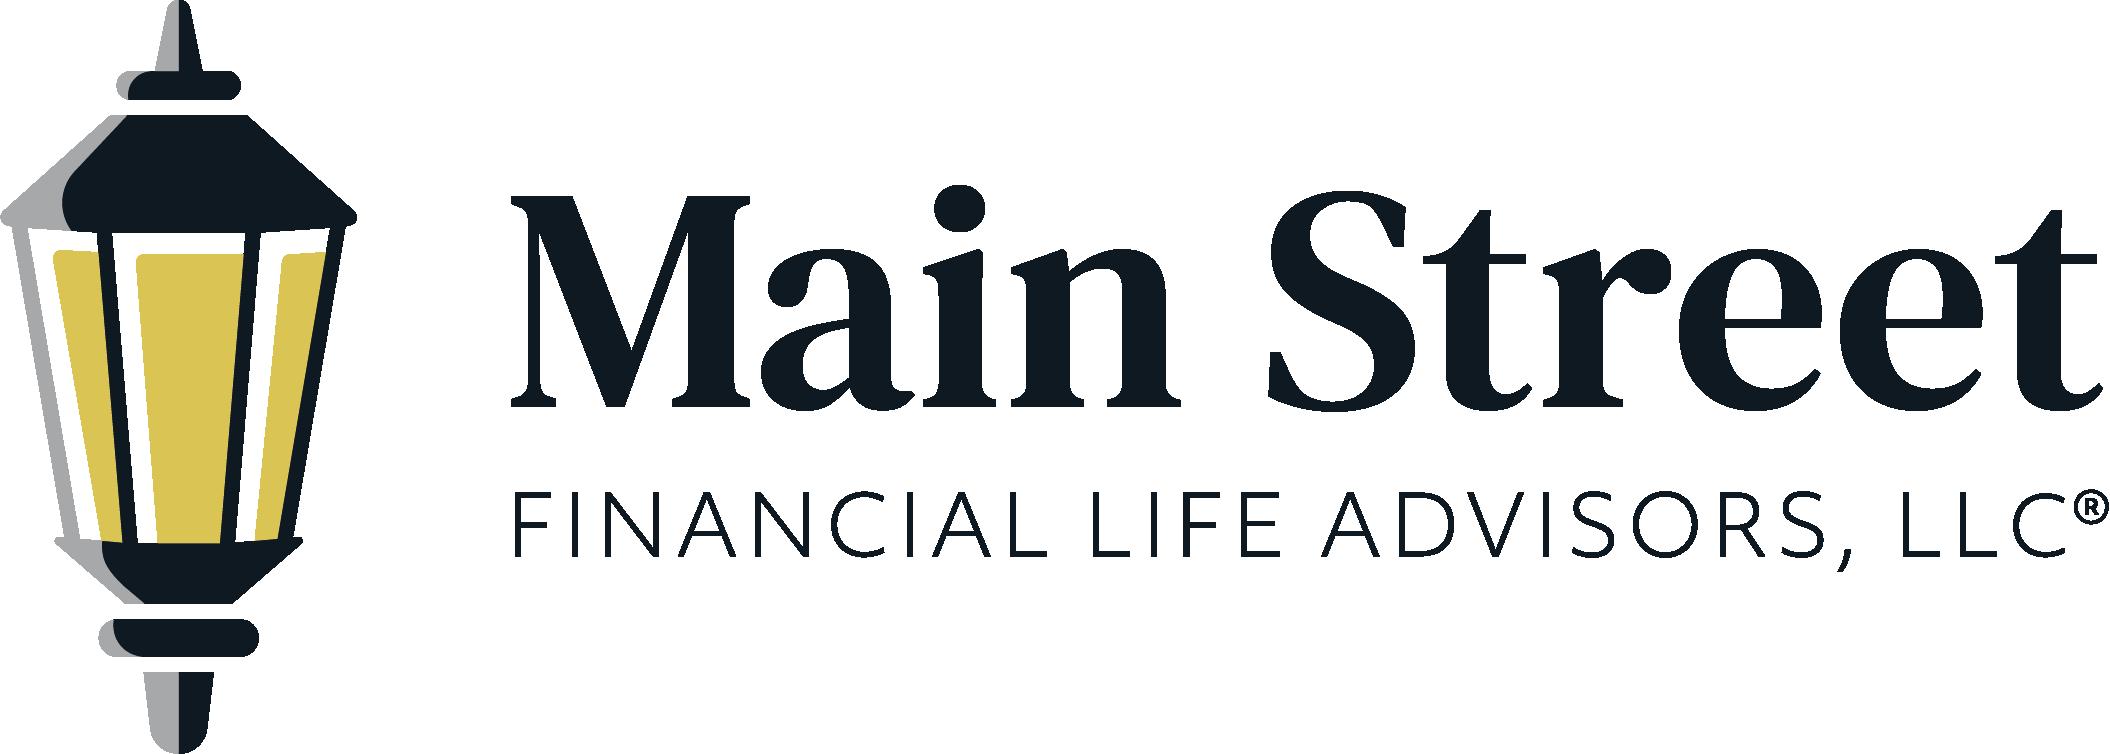 Main Street Financial Life Advisors